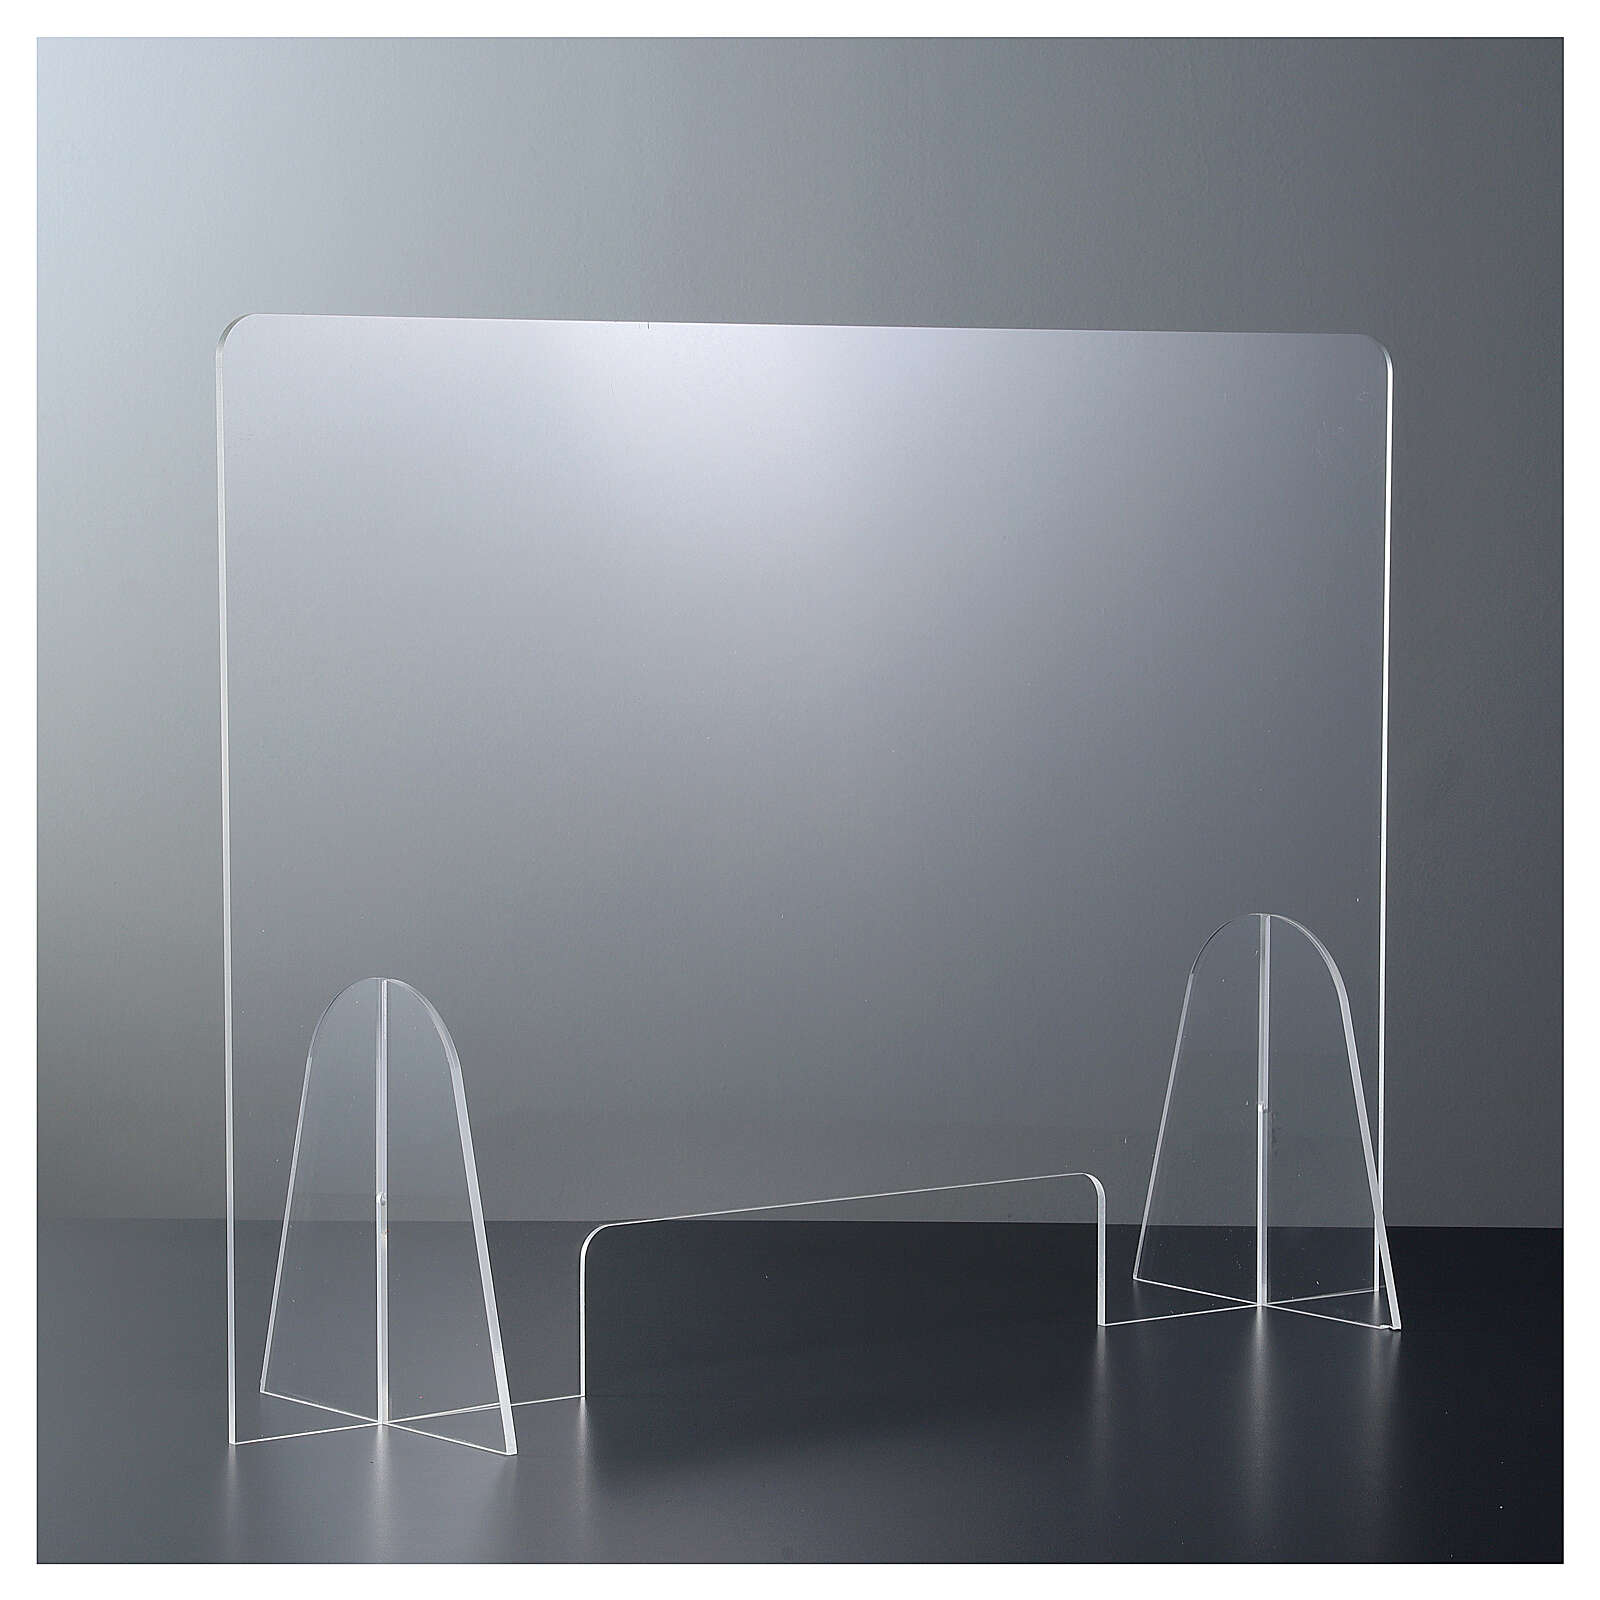 Ekran ochronny pleksiglas 50x70 okno 15x30 3